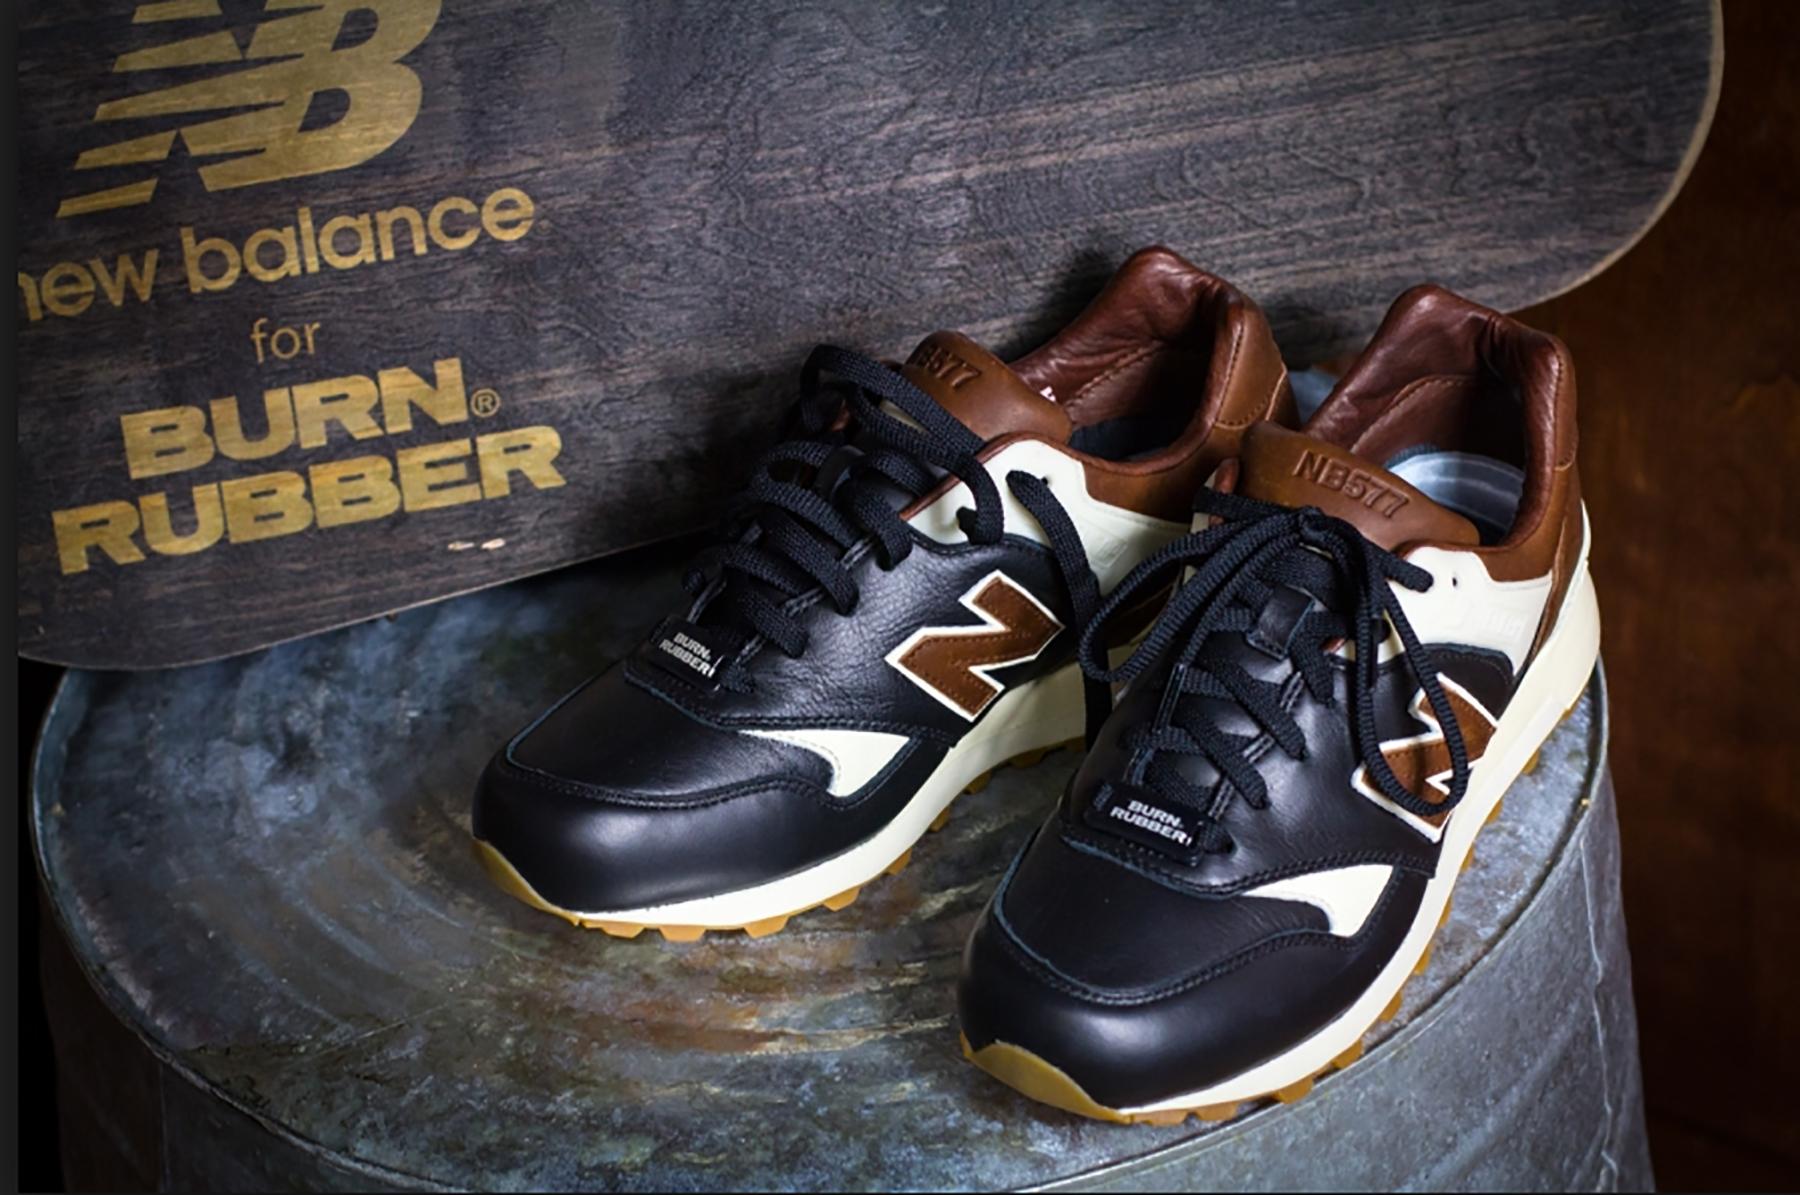 NBburnrubber2